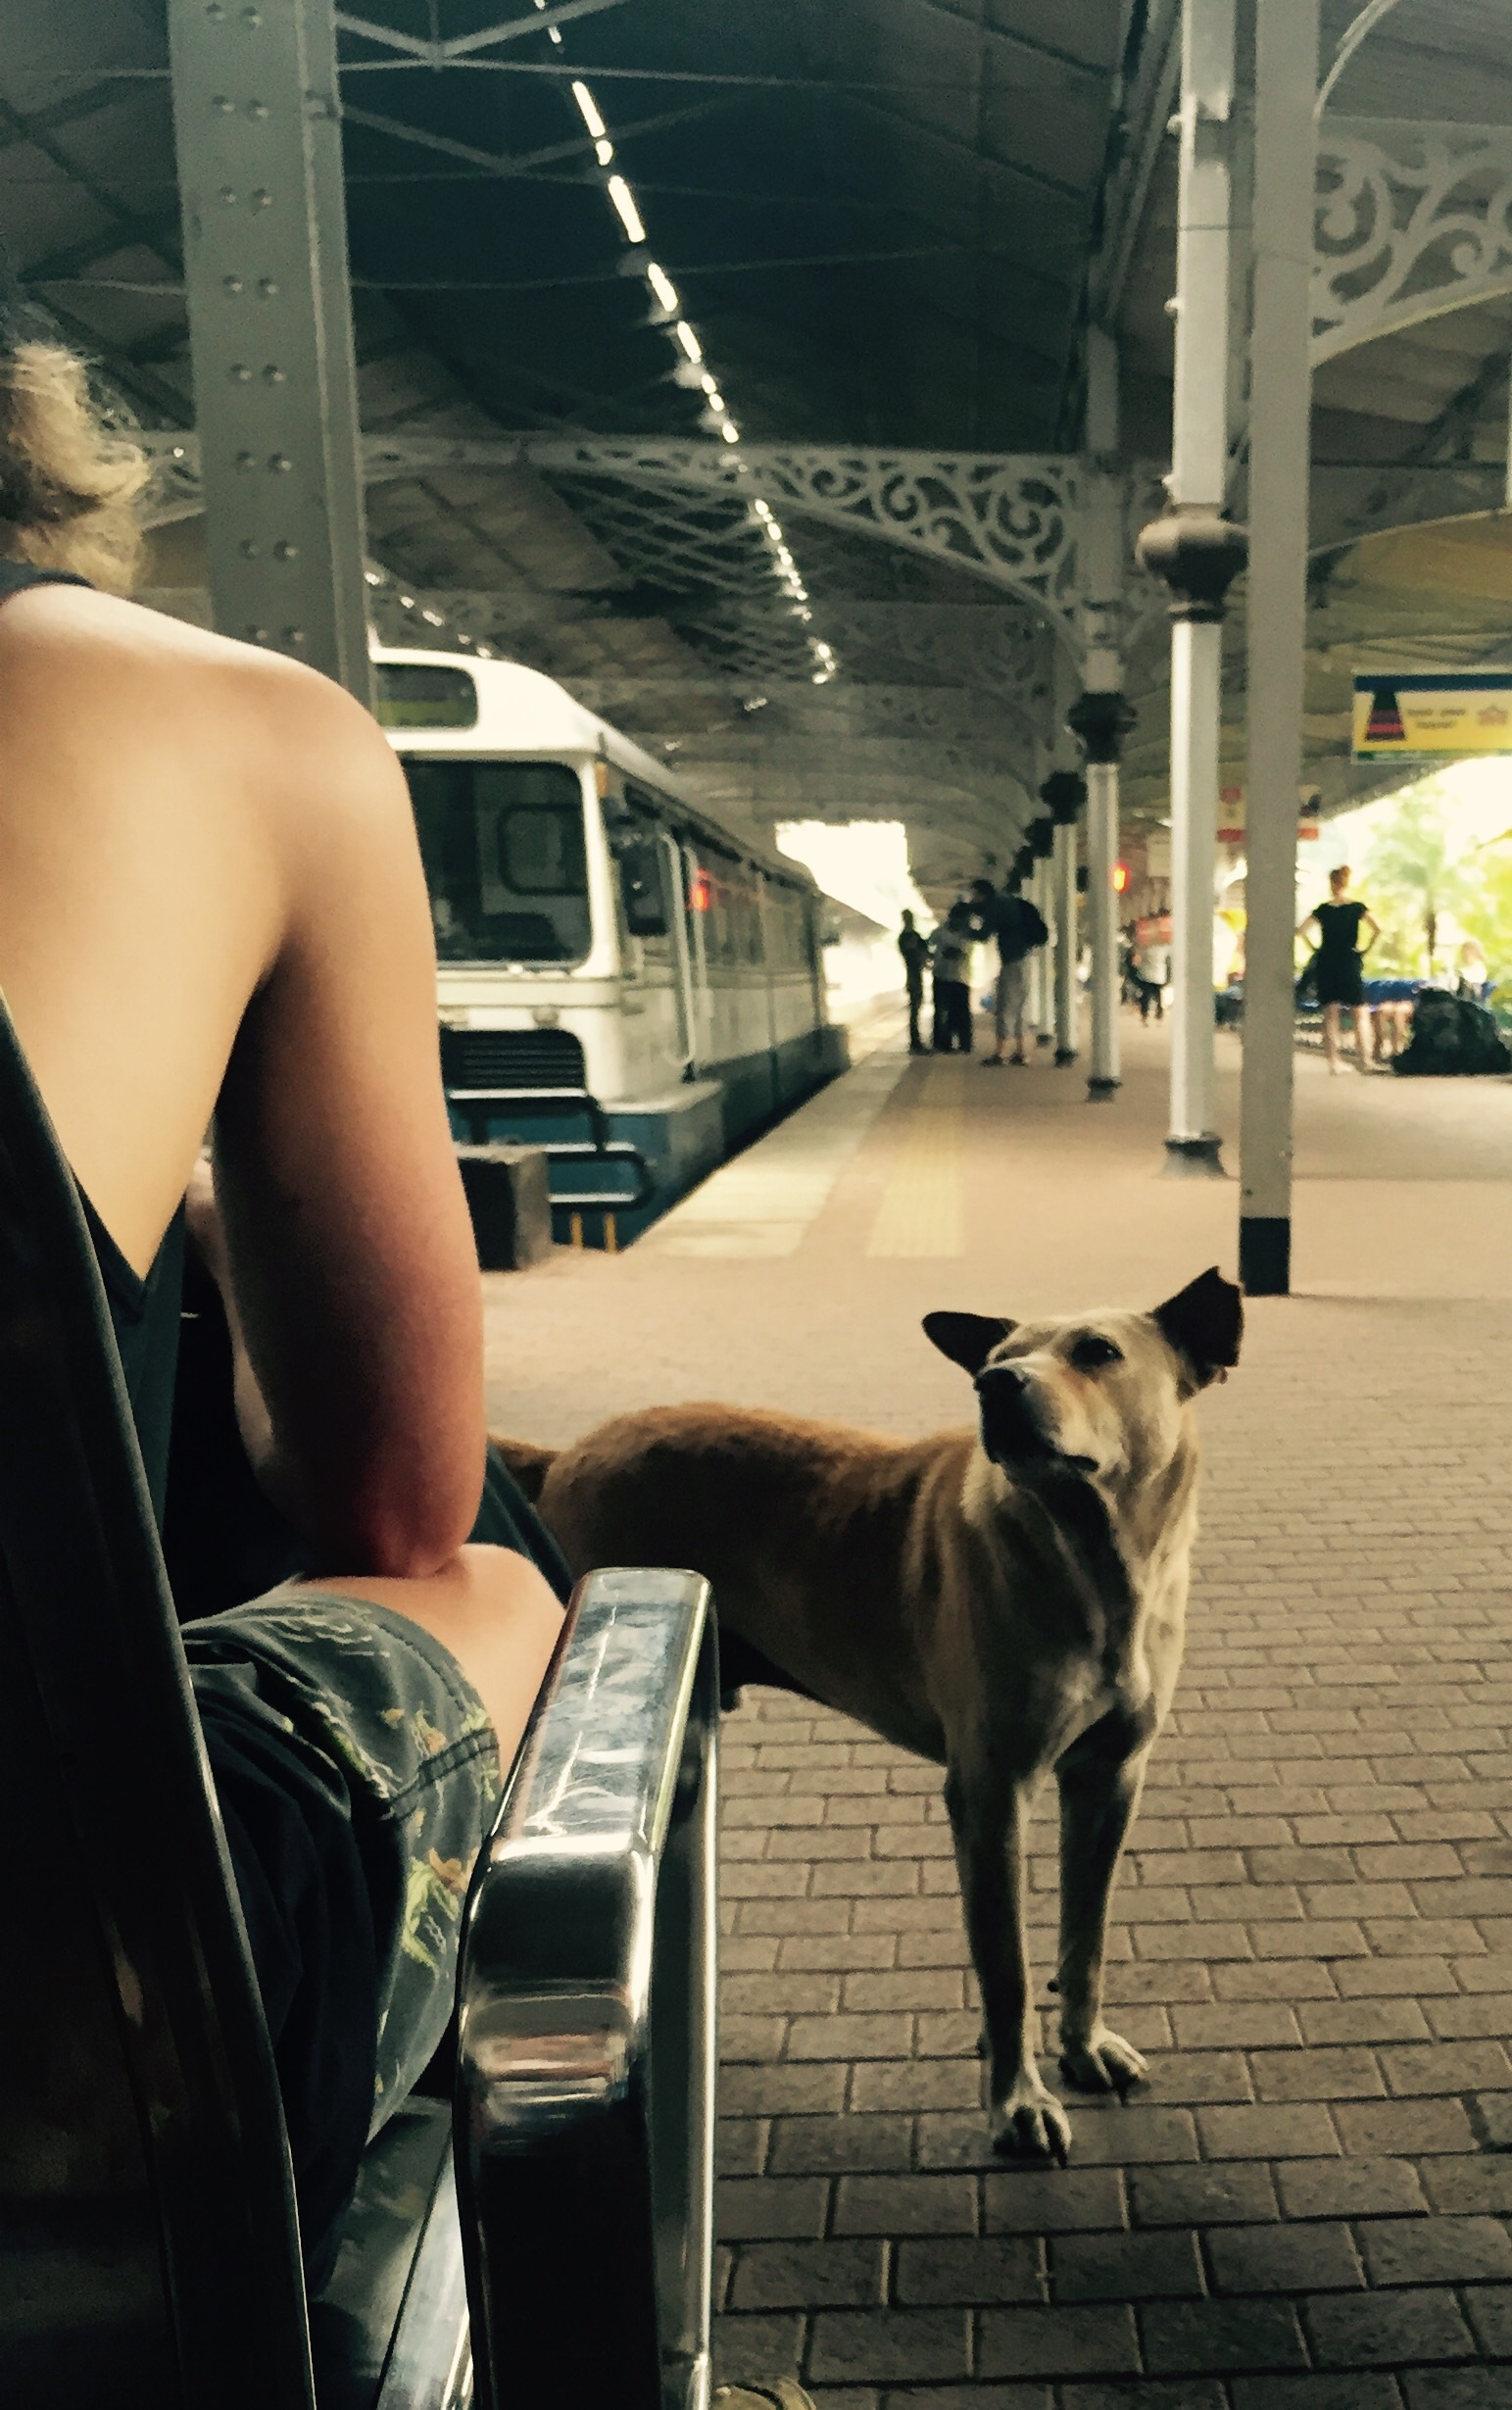 Train station brown dog.